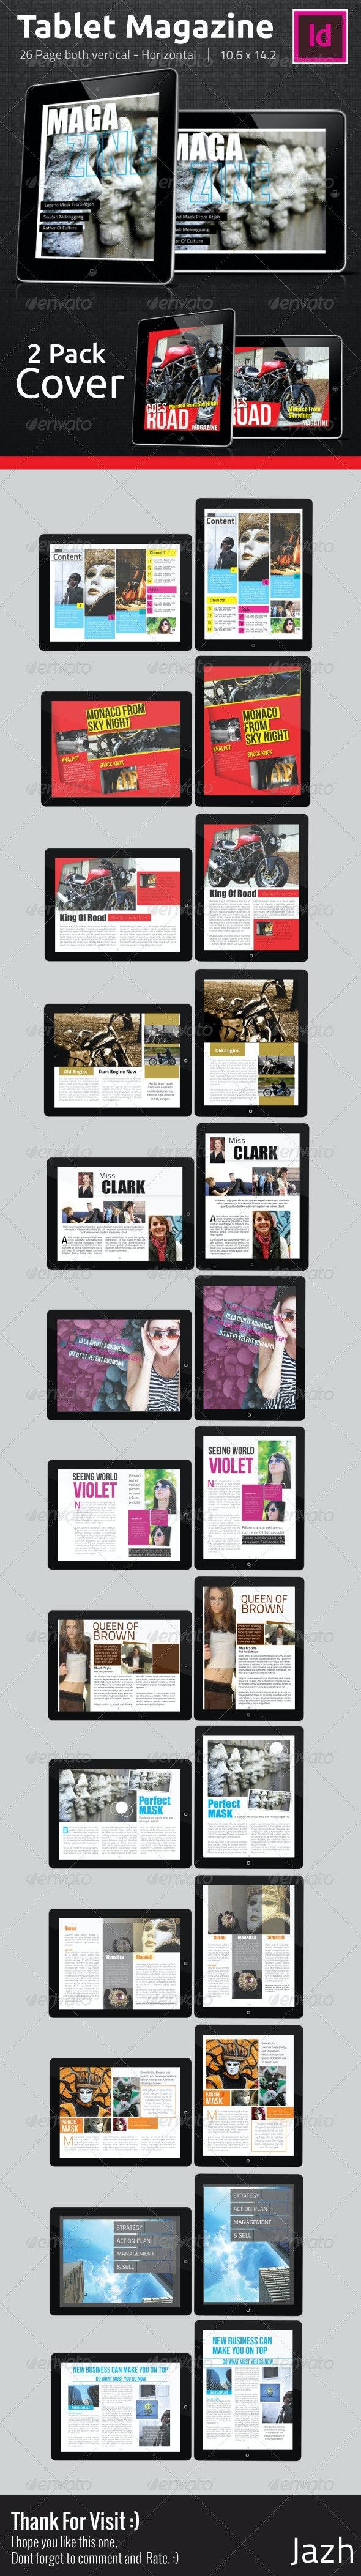 Tablet Magazine Pro E2 - Magazines Print Templates